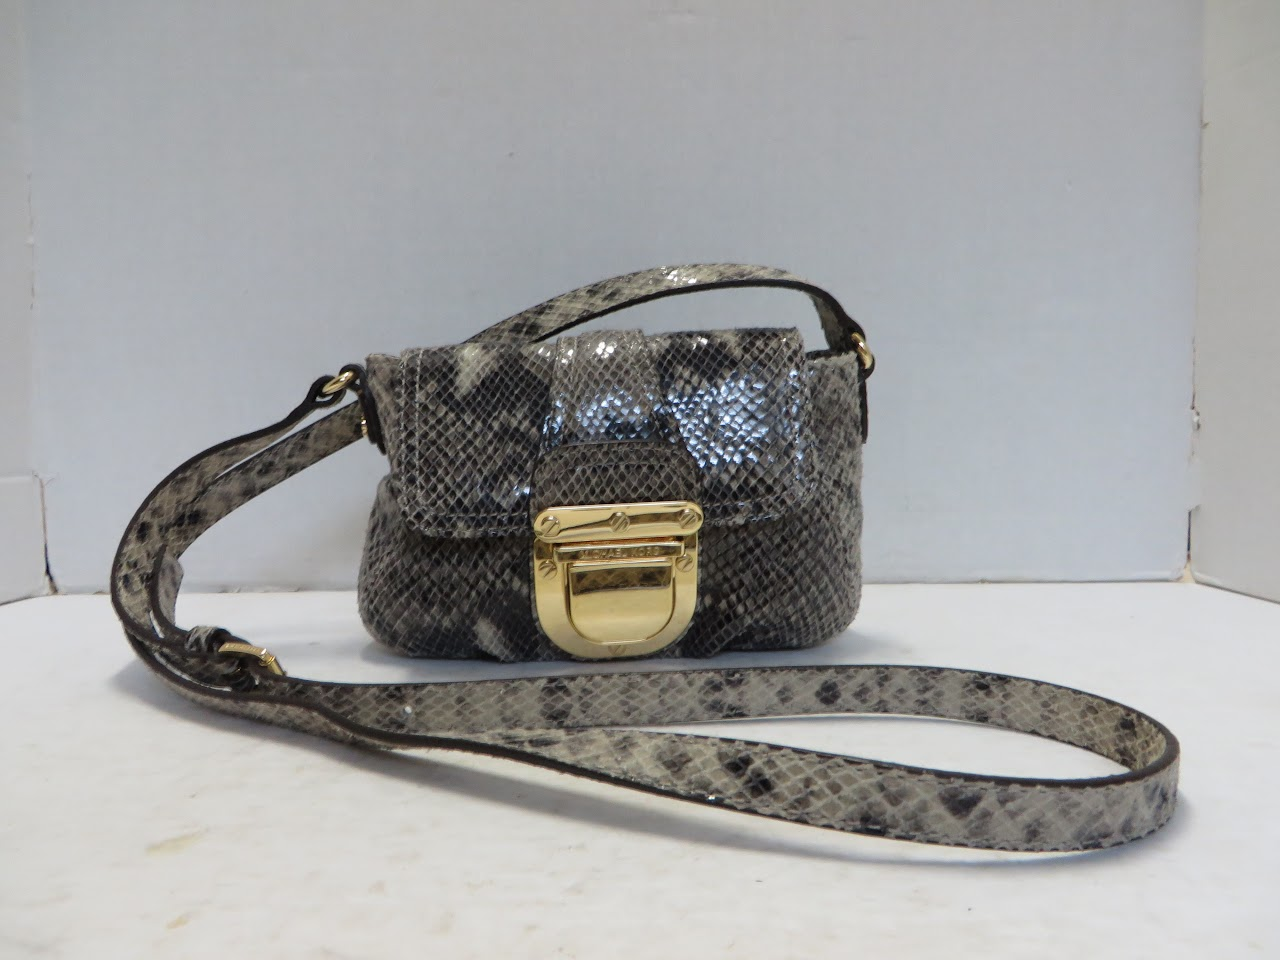 Michael Kors Faux Snakeskin Evening Bag